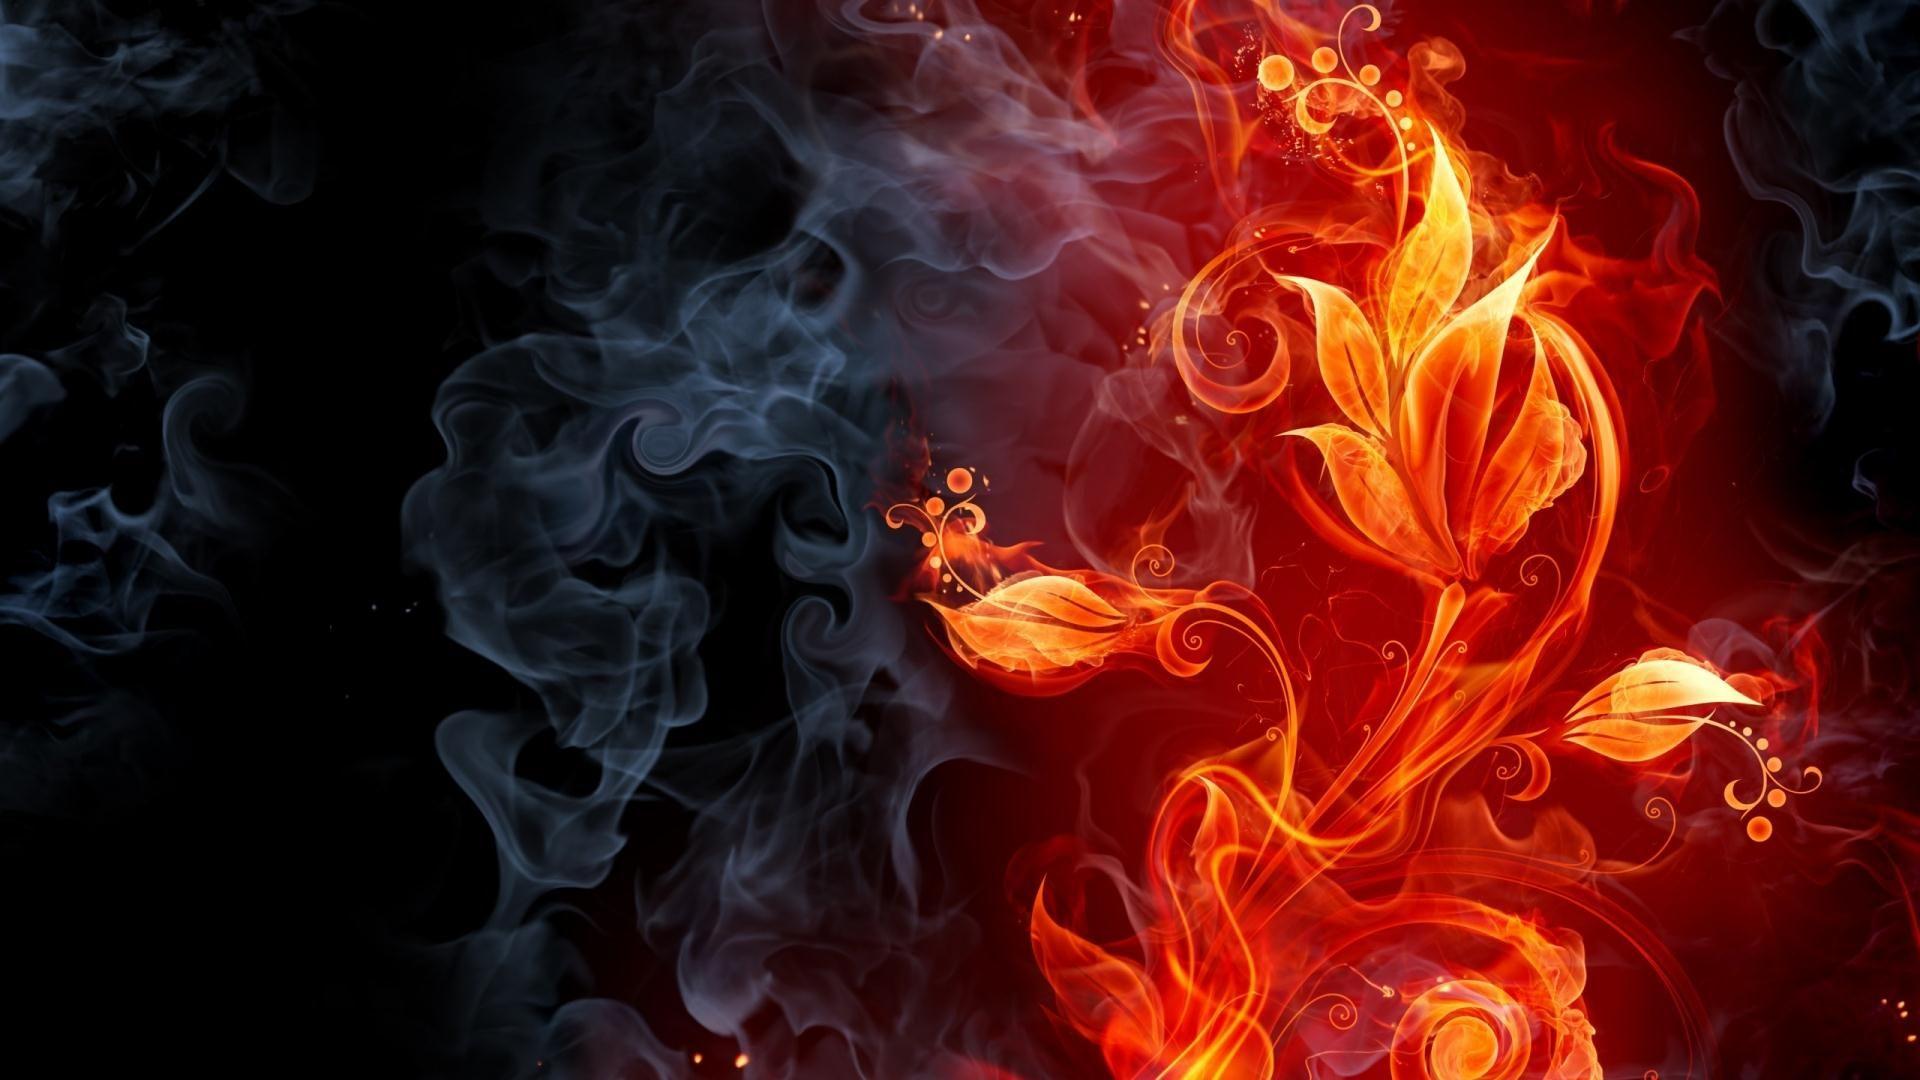 Fire Wallpaper Creative Wallpapers WPRT LanLinGLaureL